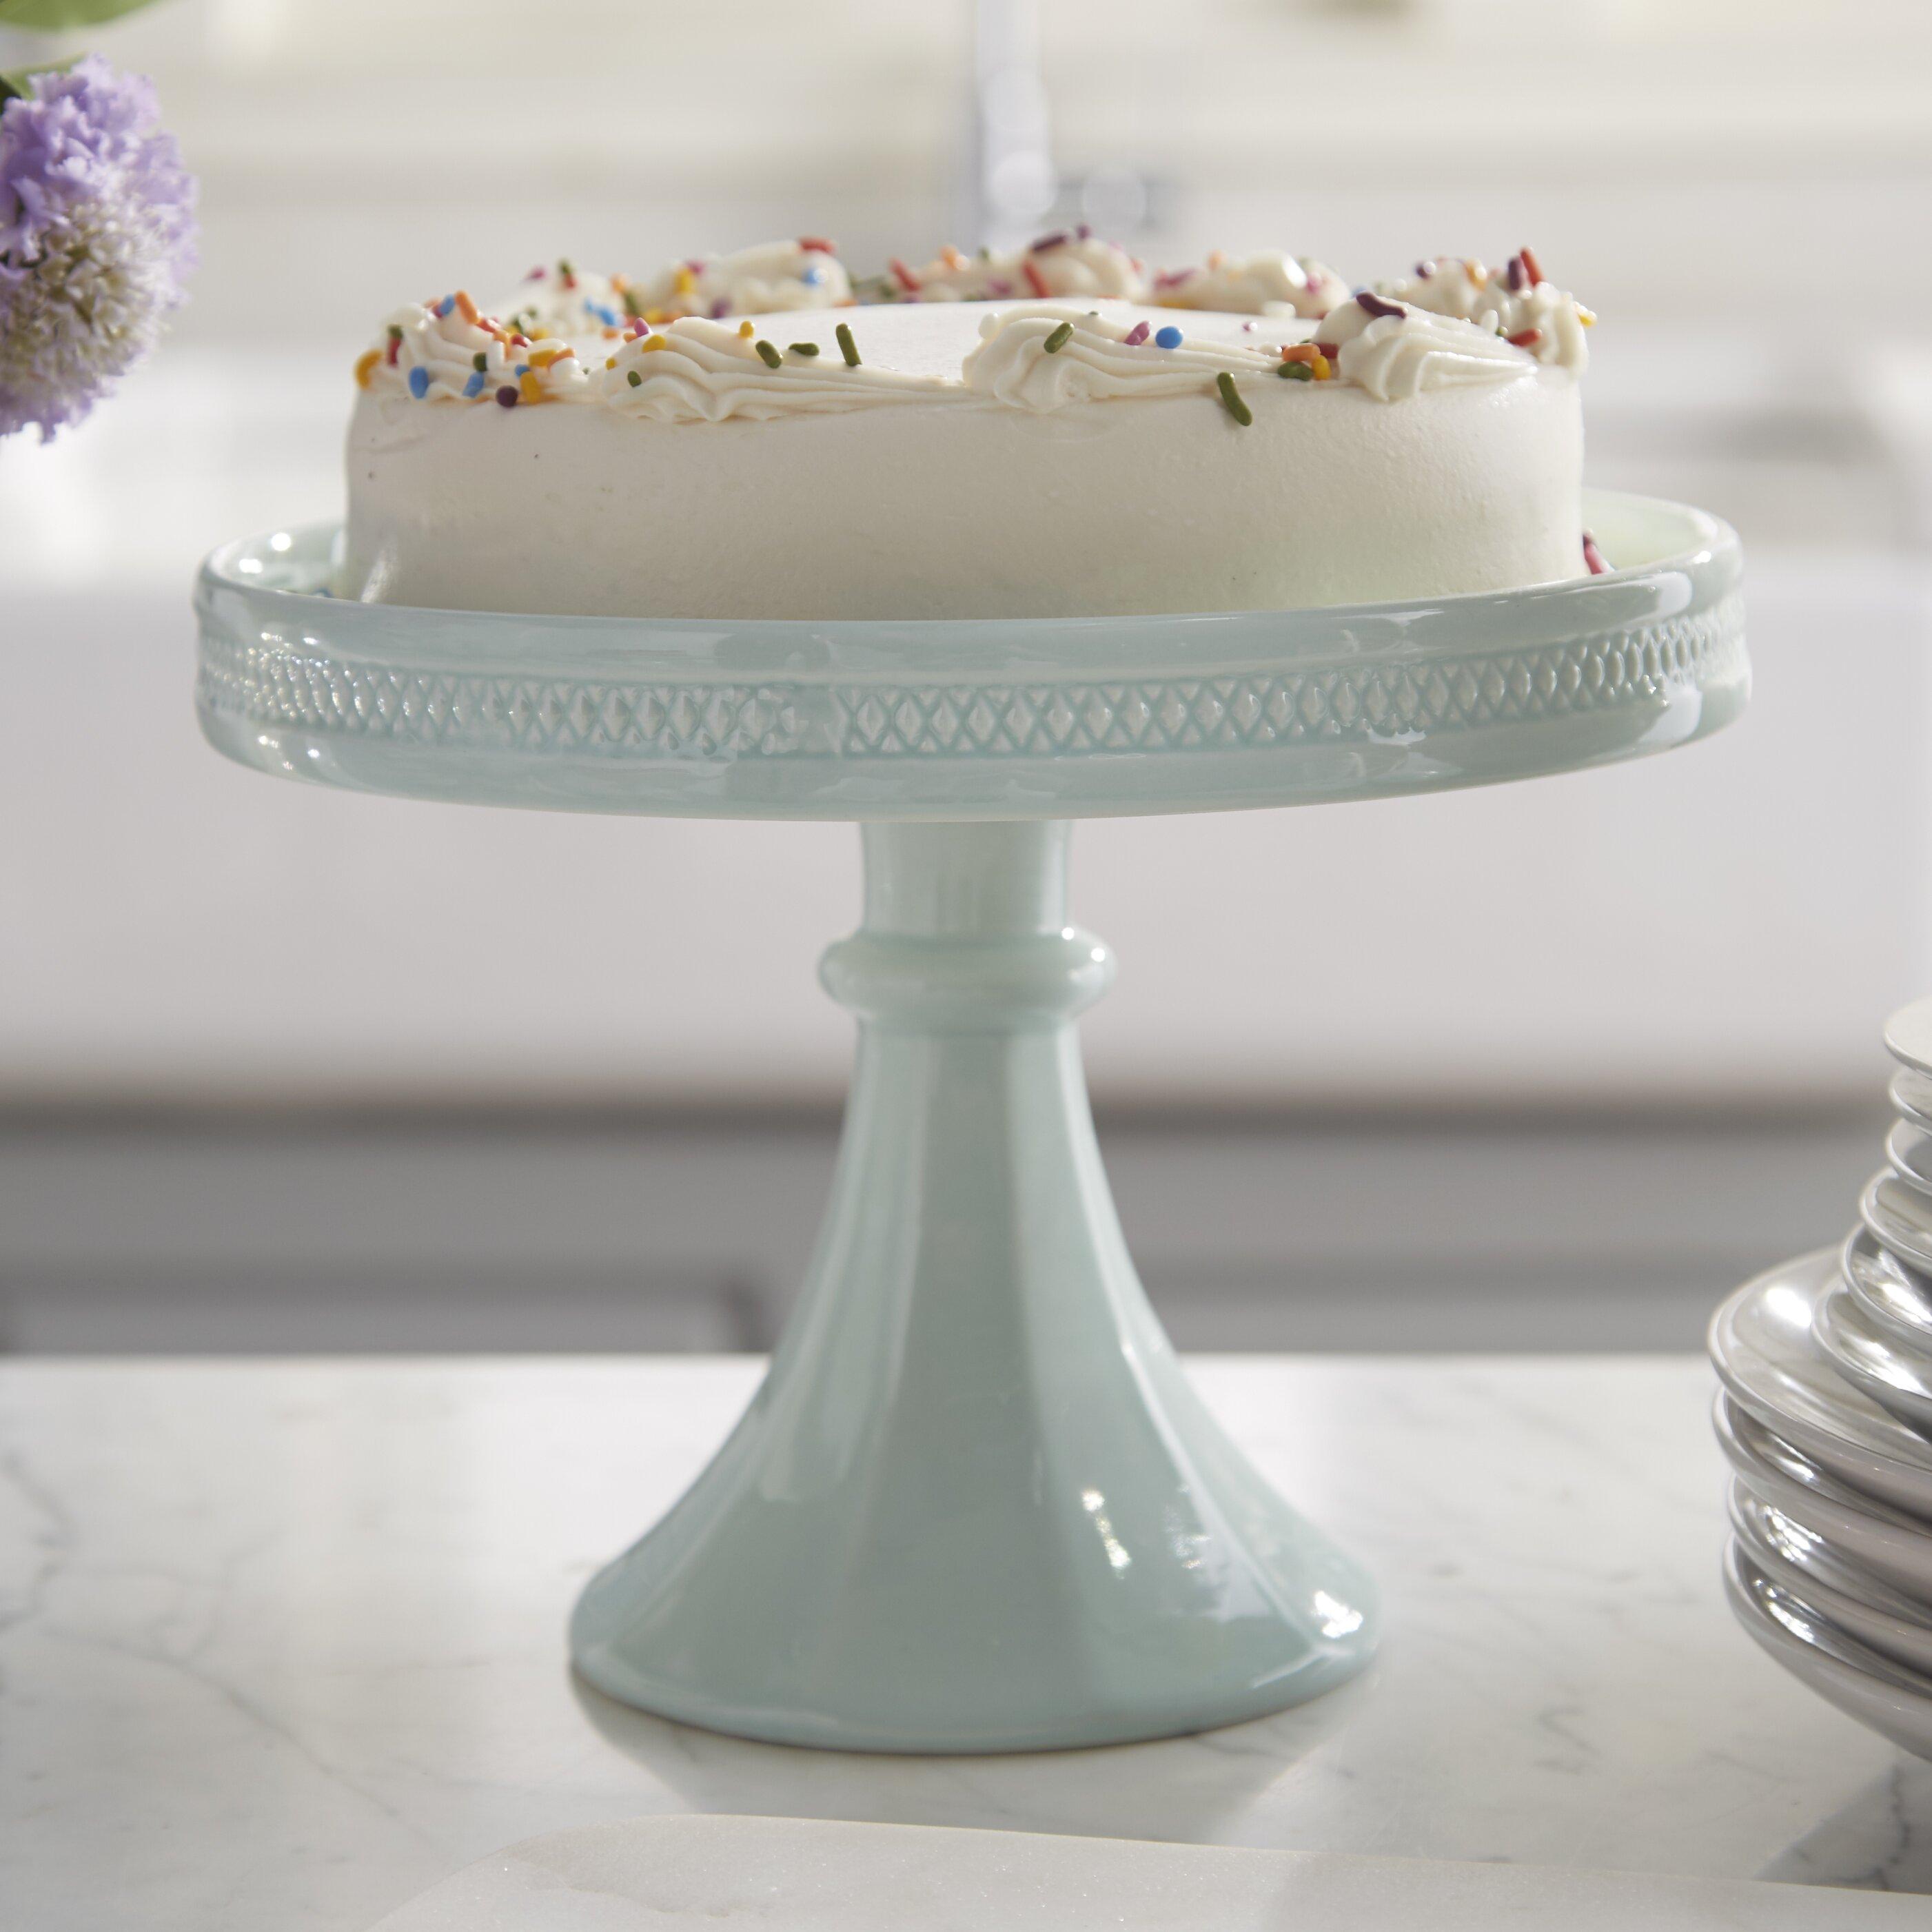 Decorative Cake Stands Rosanna Decor Bon Bon Hue Rimmed Pedestal Cake Stand Reviews